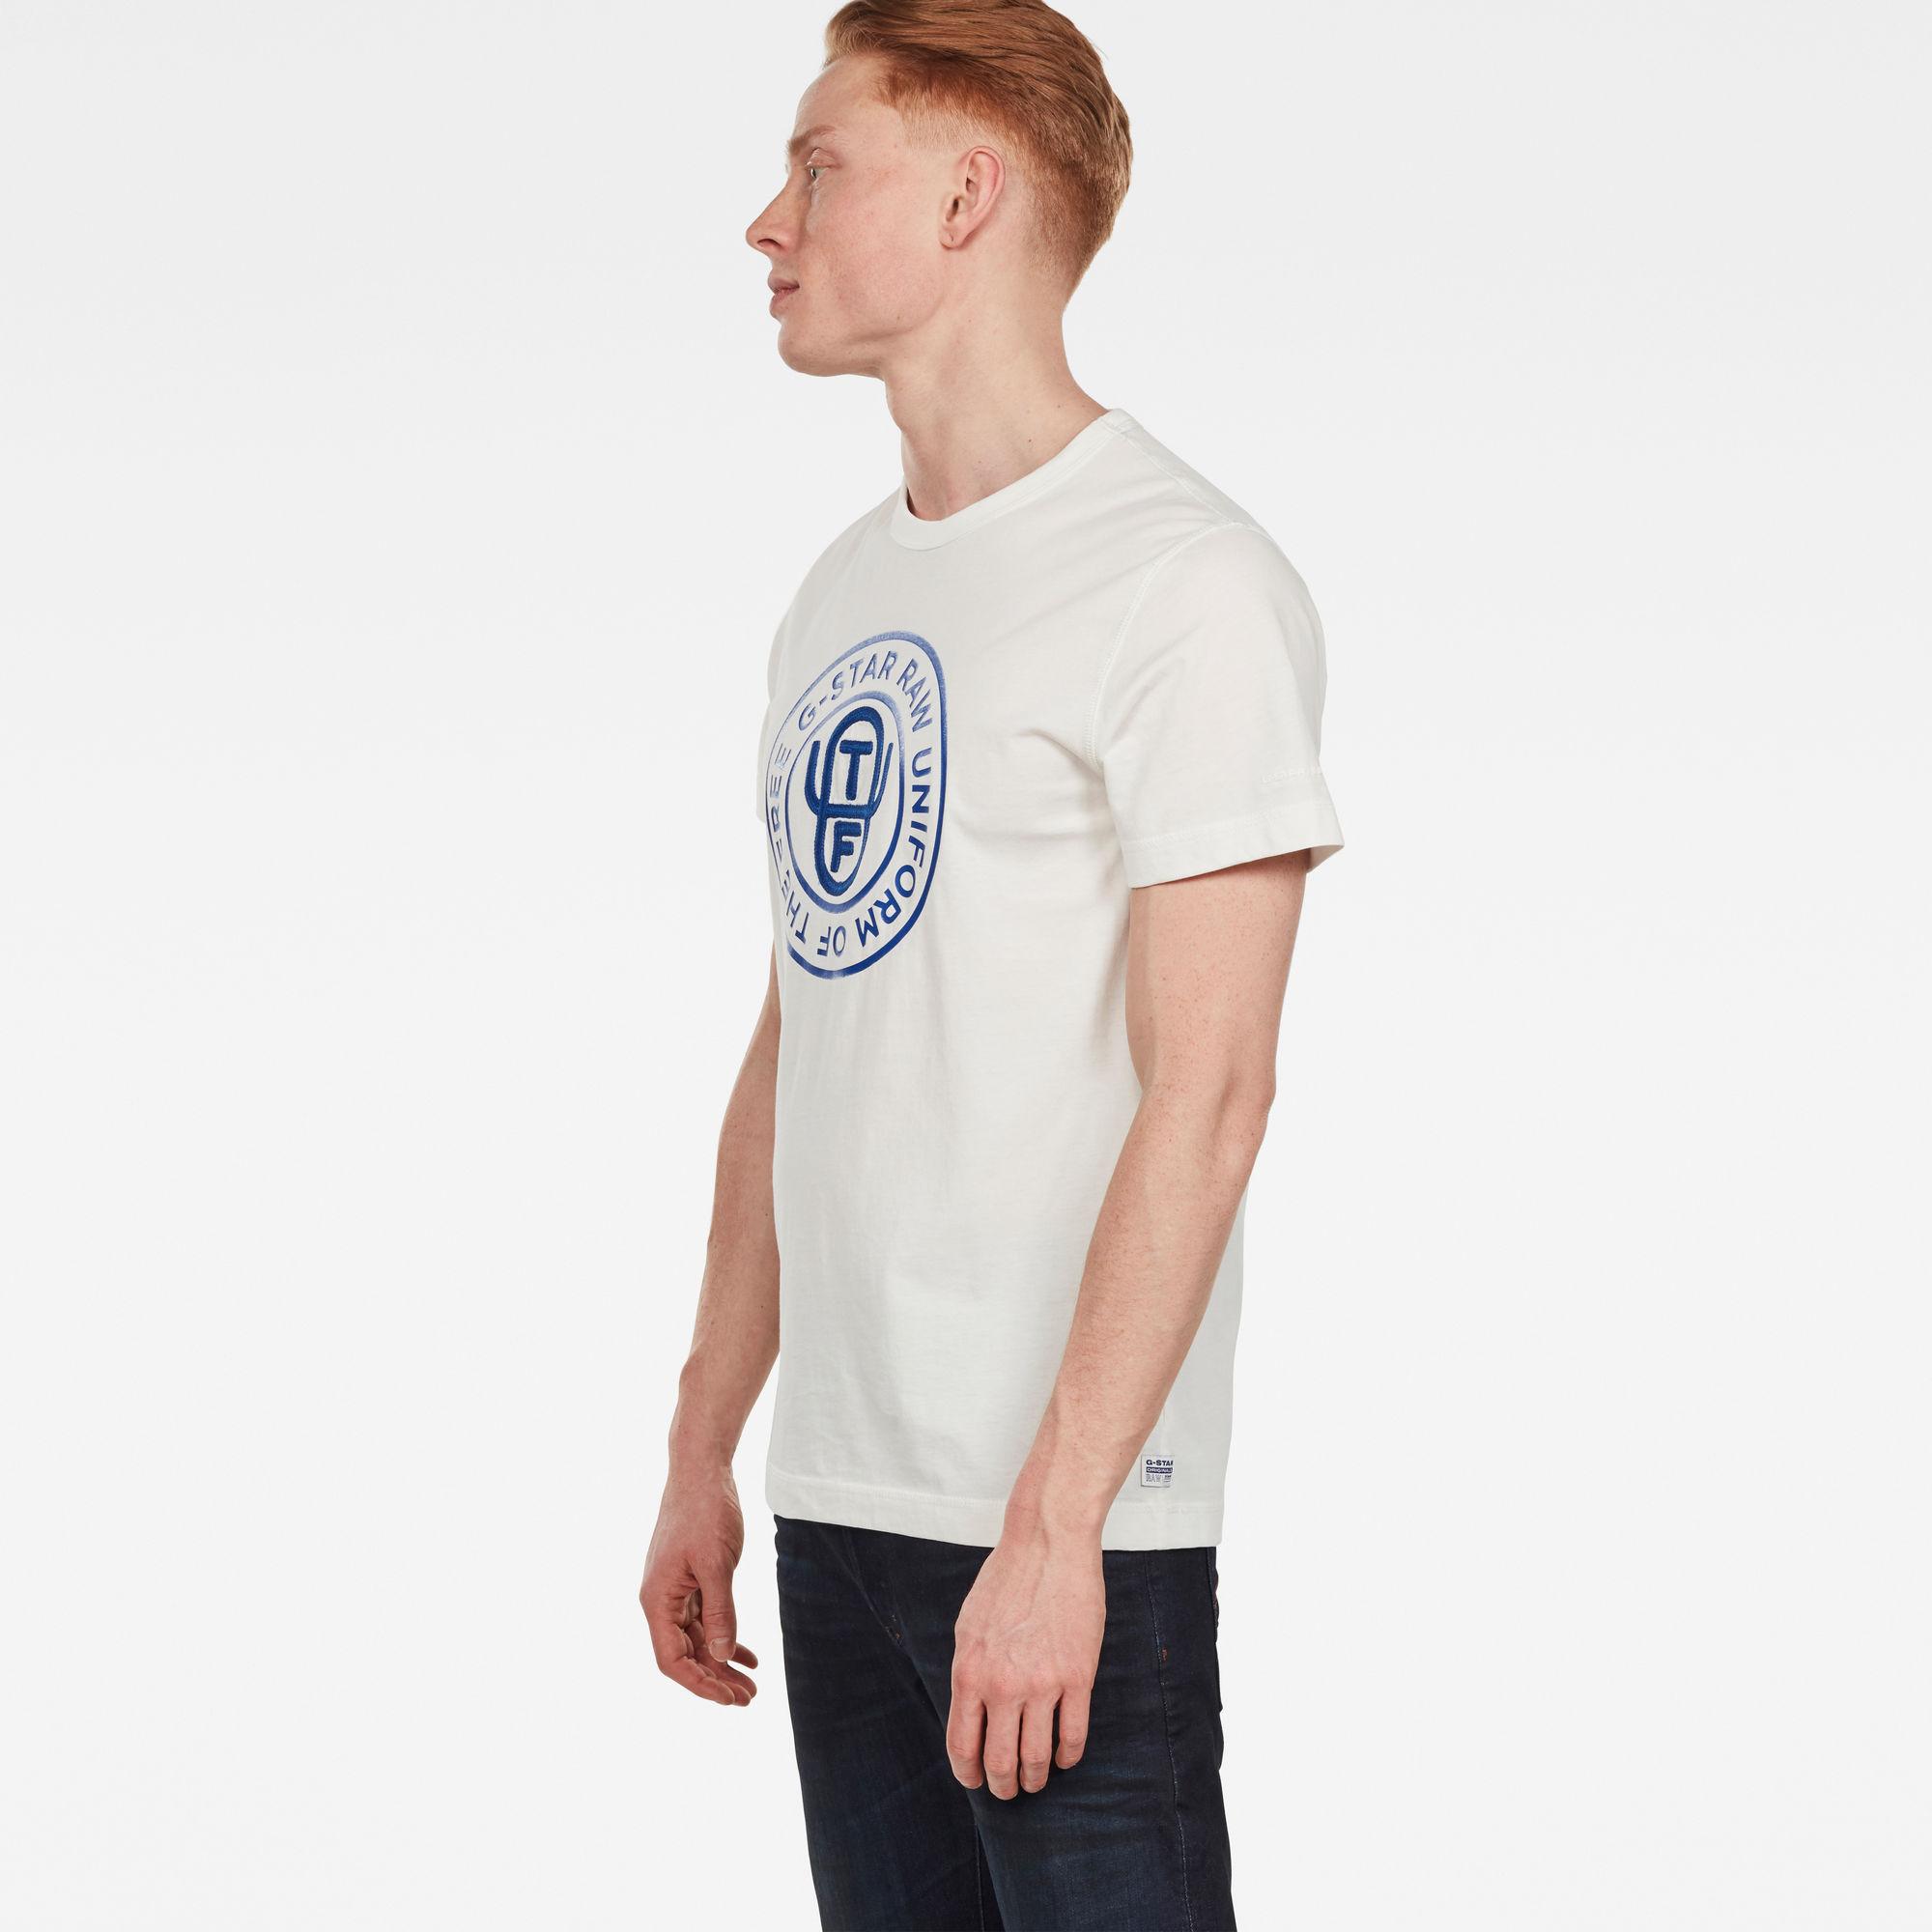 G-Star RAW Graphic 5 T-Shirt